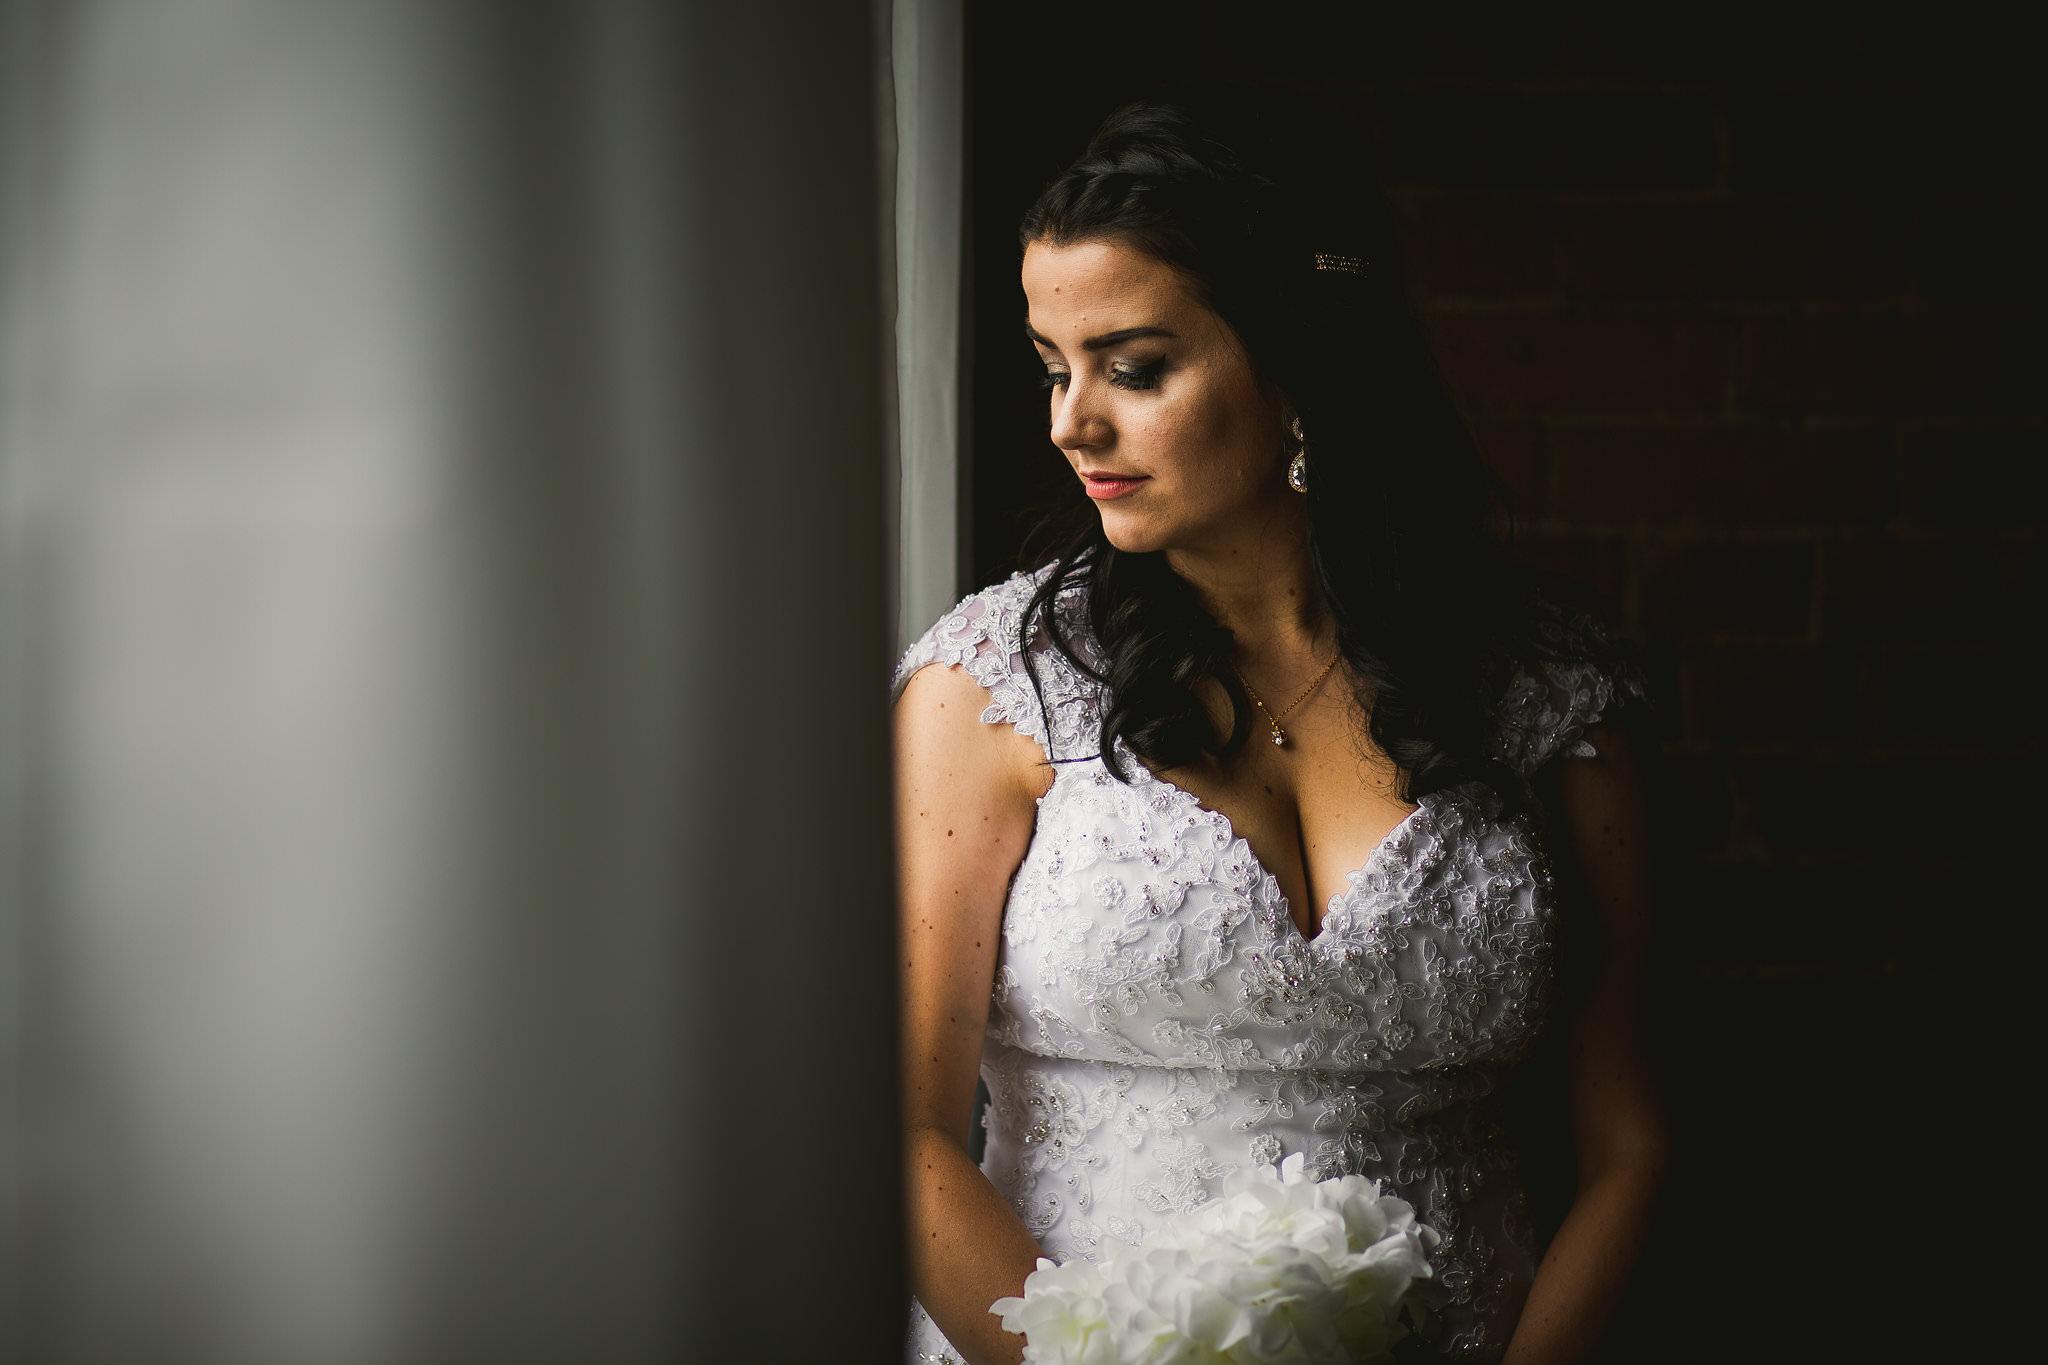 Kristen Adam Kindred Loft Whitby Wedding Photos 284 - Durham Wedding Photographer: Kindred Loft Wedding Photos